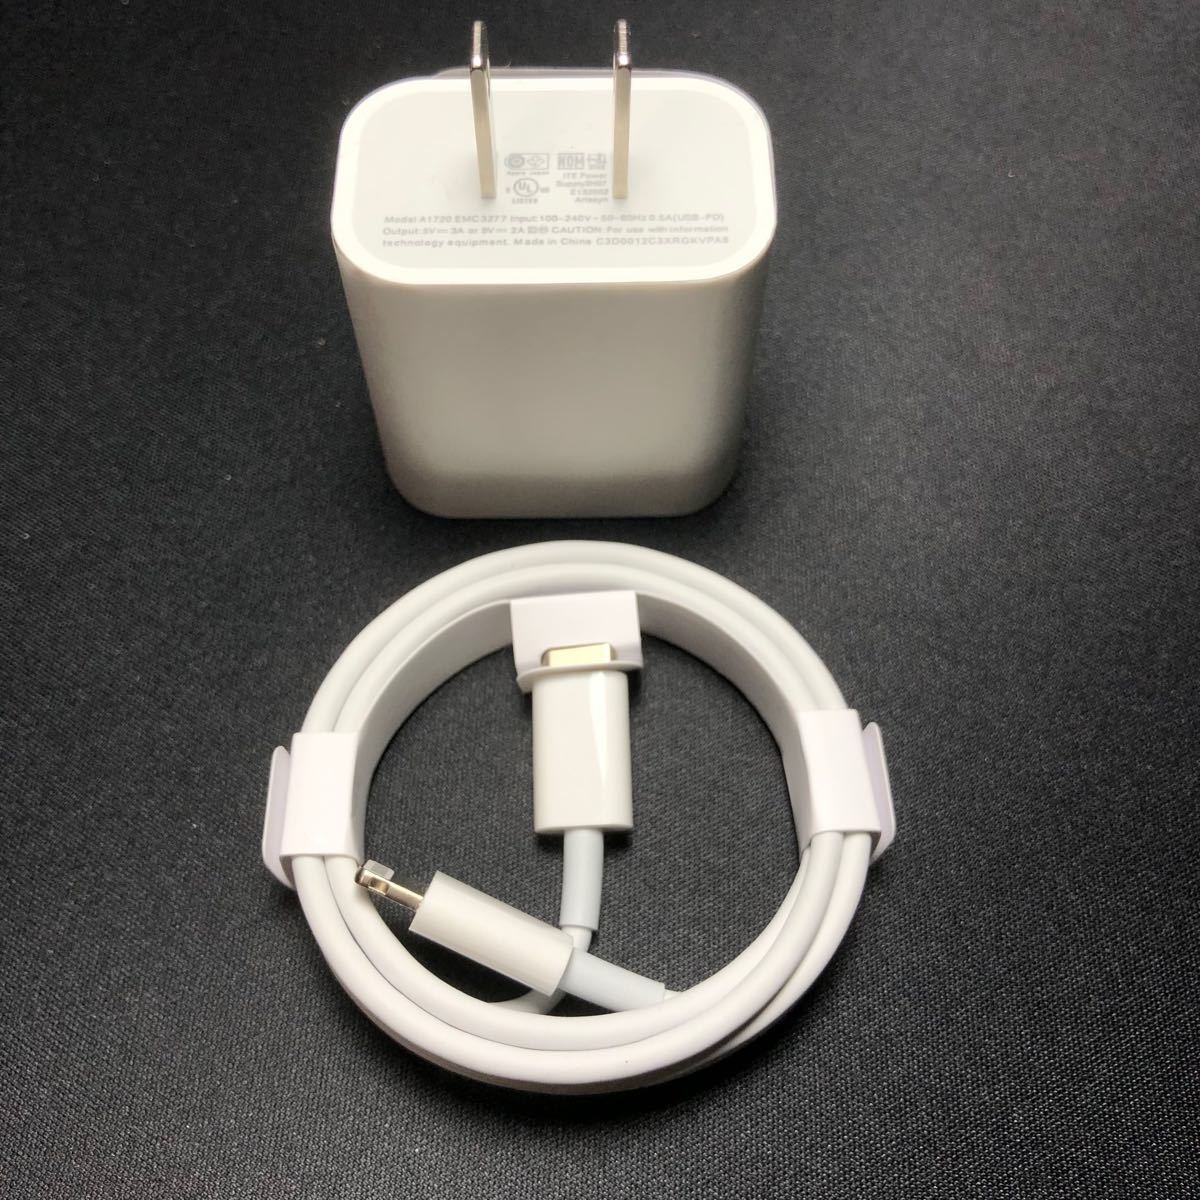 iPhone充電器1m type-c USB-Cケーブルアダプターセット純正品質 ライトニングケーブル 充電器